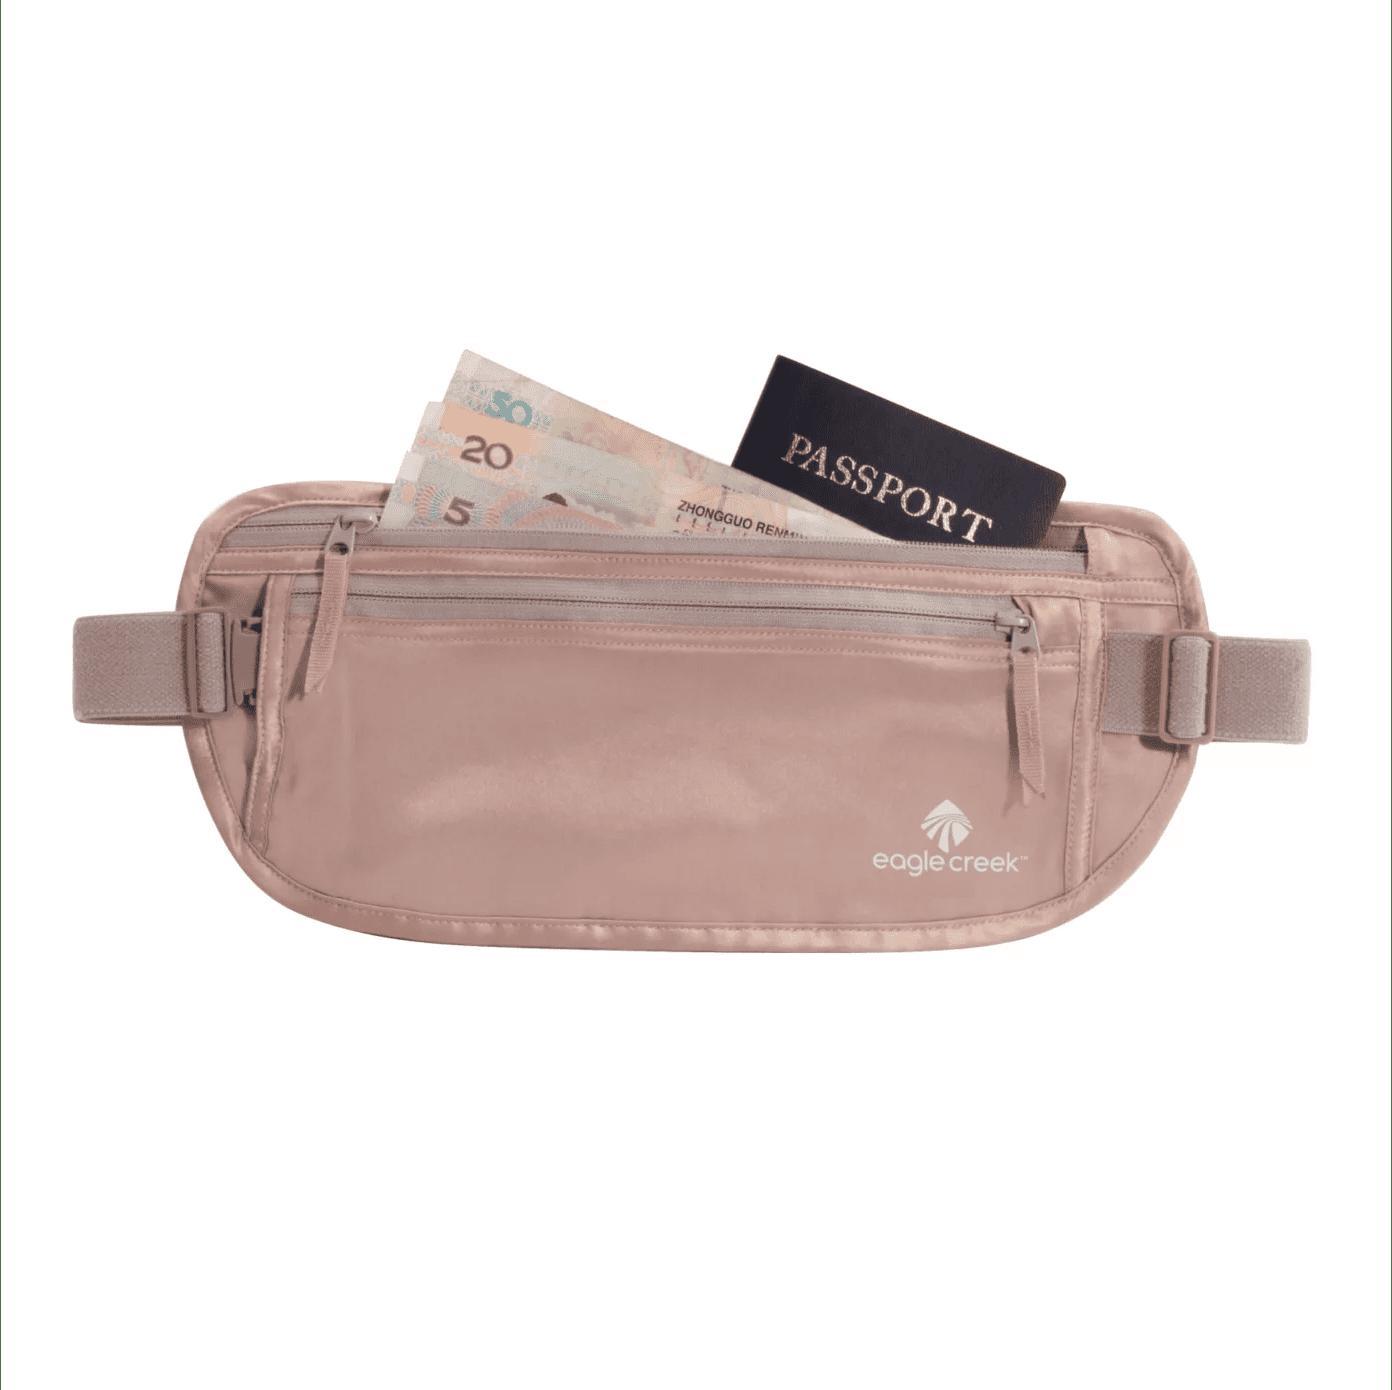 Eagle Creek Silk Undercover Travel Money Belt